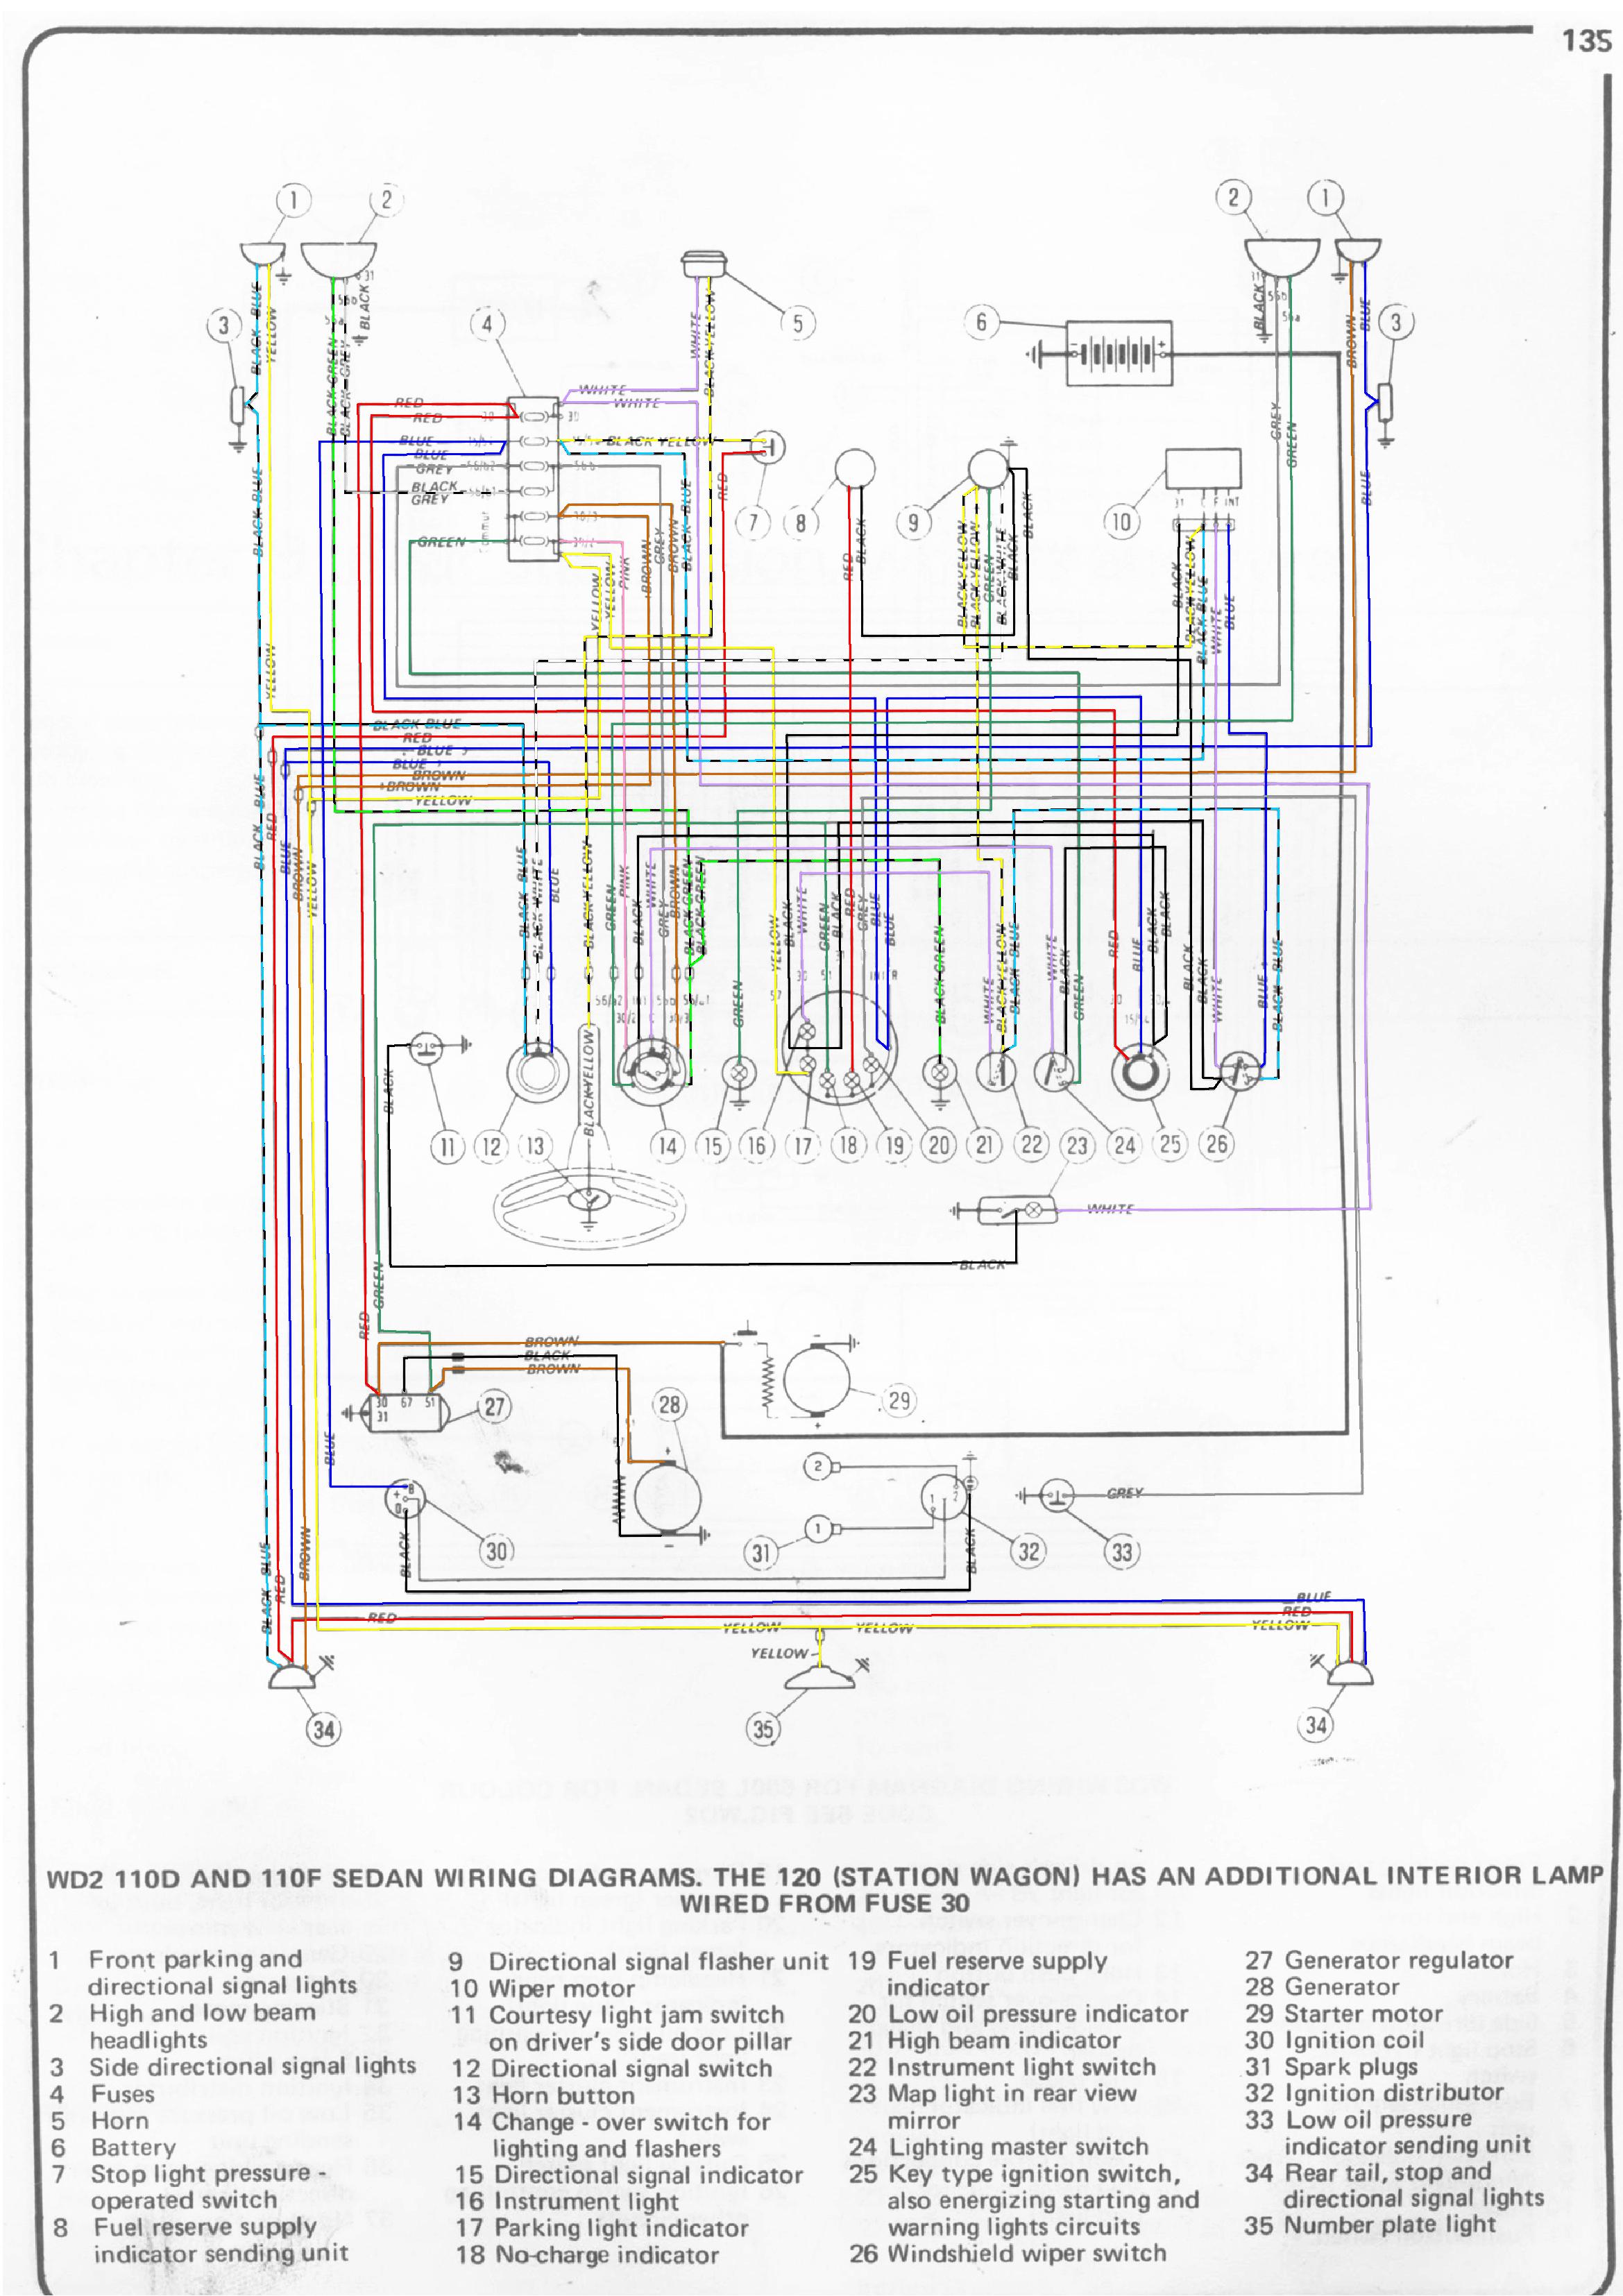 Apc Matrix 500 Wiring Diagram Electrical Schematics For Dummies Trusted Diagrams Hewlett Packard